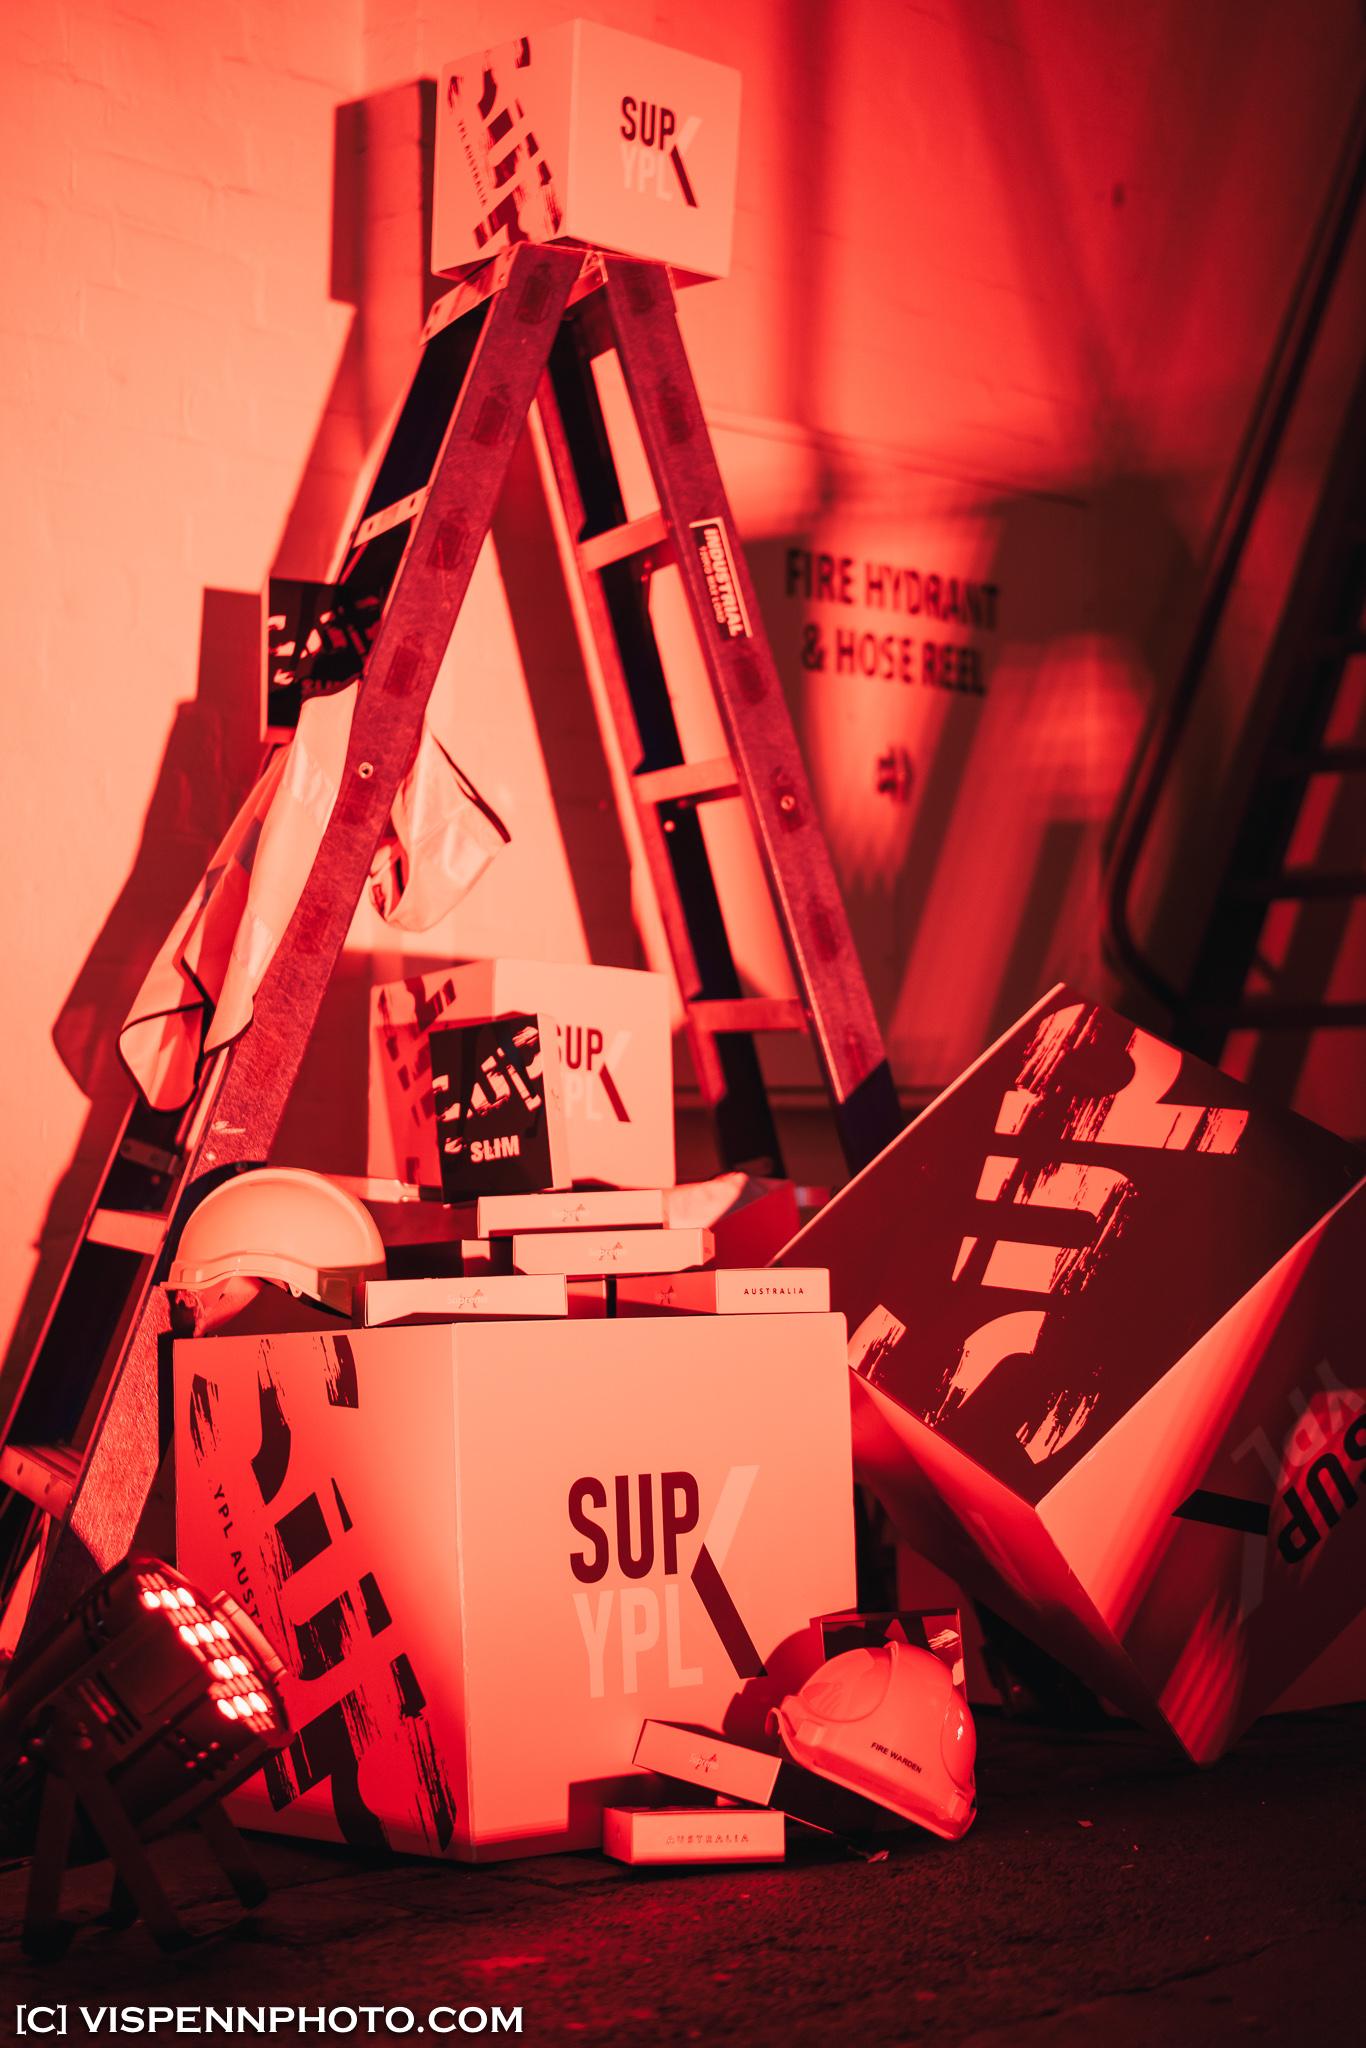 Melbourne Events Photography VISPENN 墨尔本 活动摄影 年会拍摄 YPL 1170 HSony VISPENN